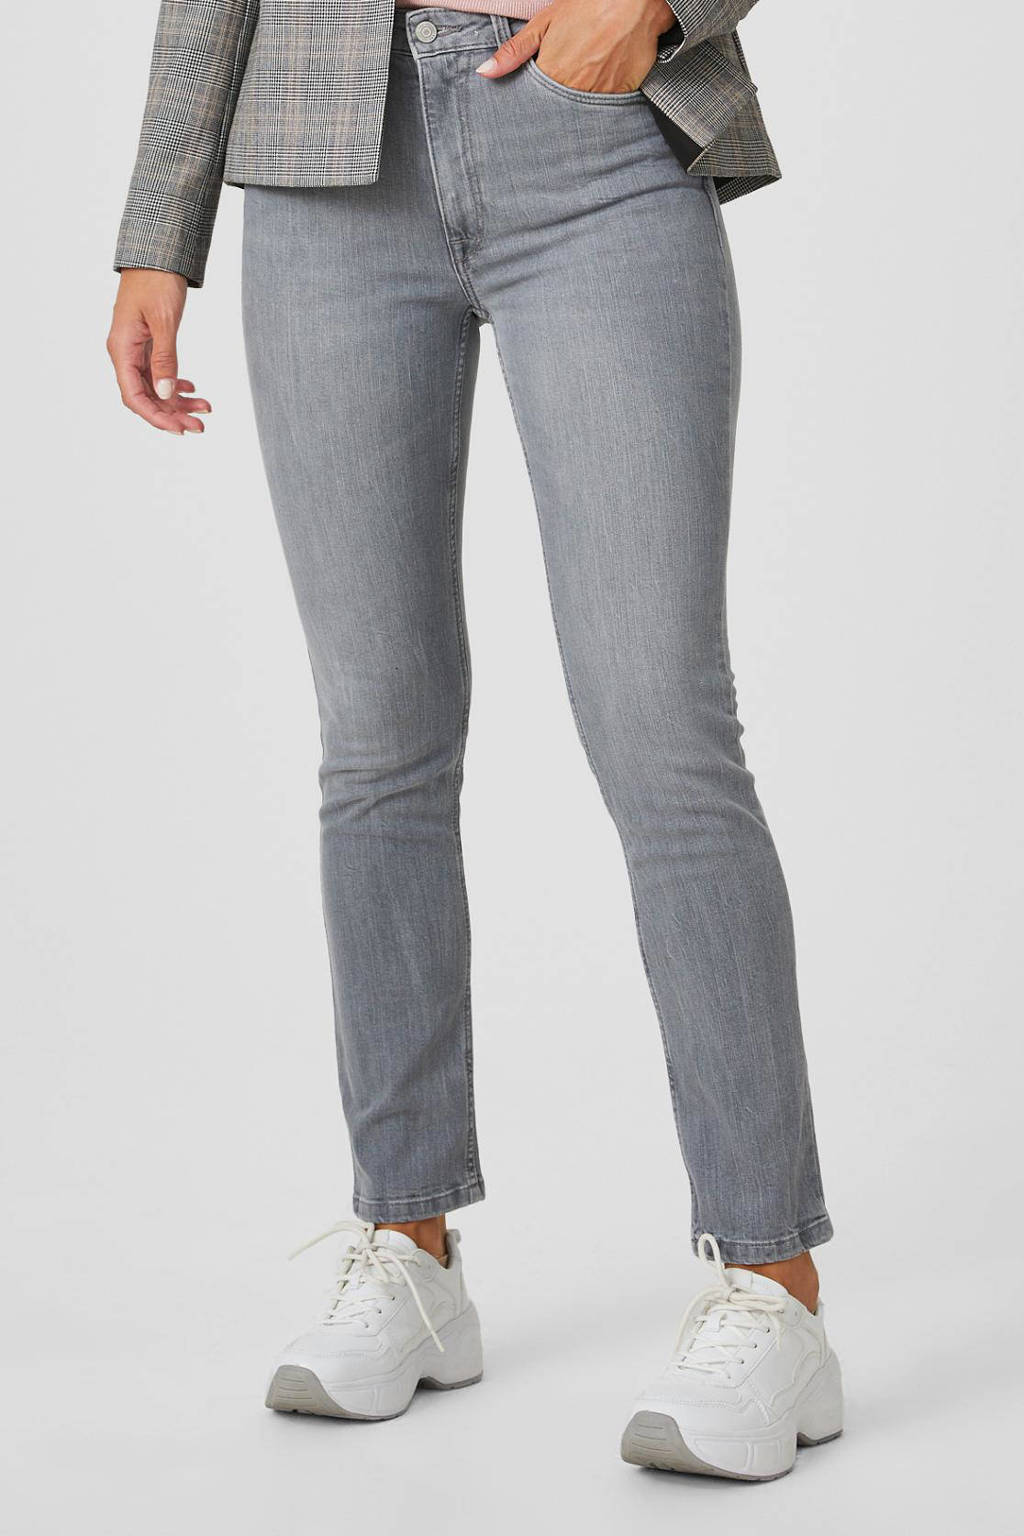 C&A The Denim high waist slim fit jeans lichtgrijs stonewashed, Lichtgrijs stonewashed